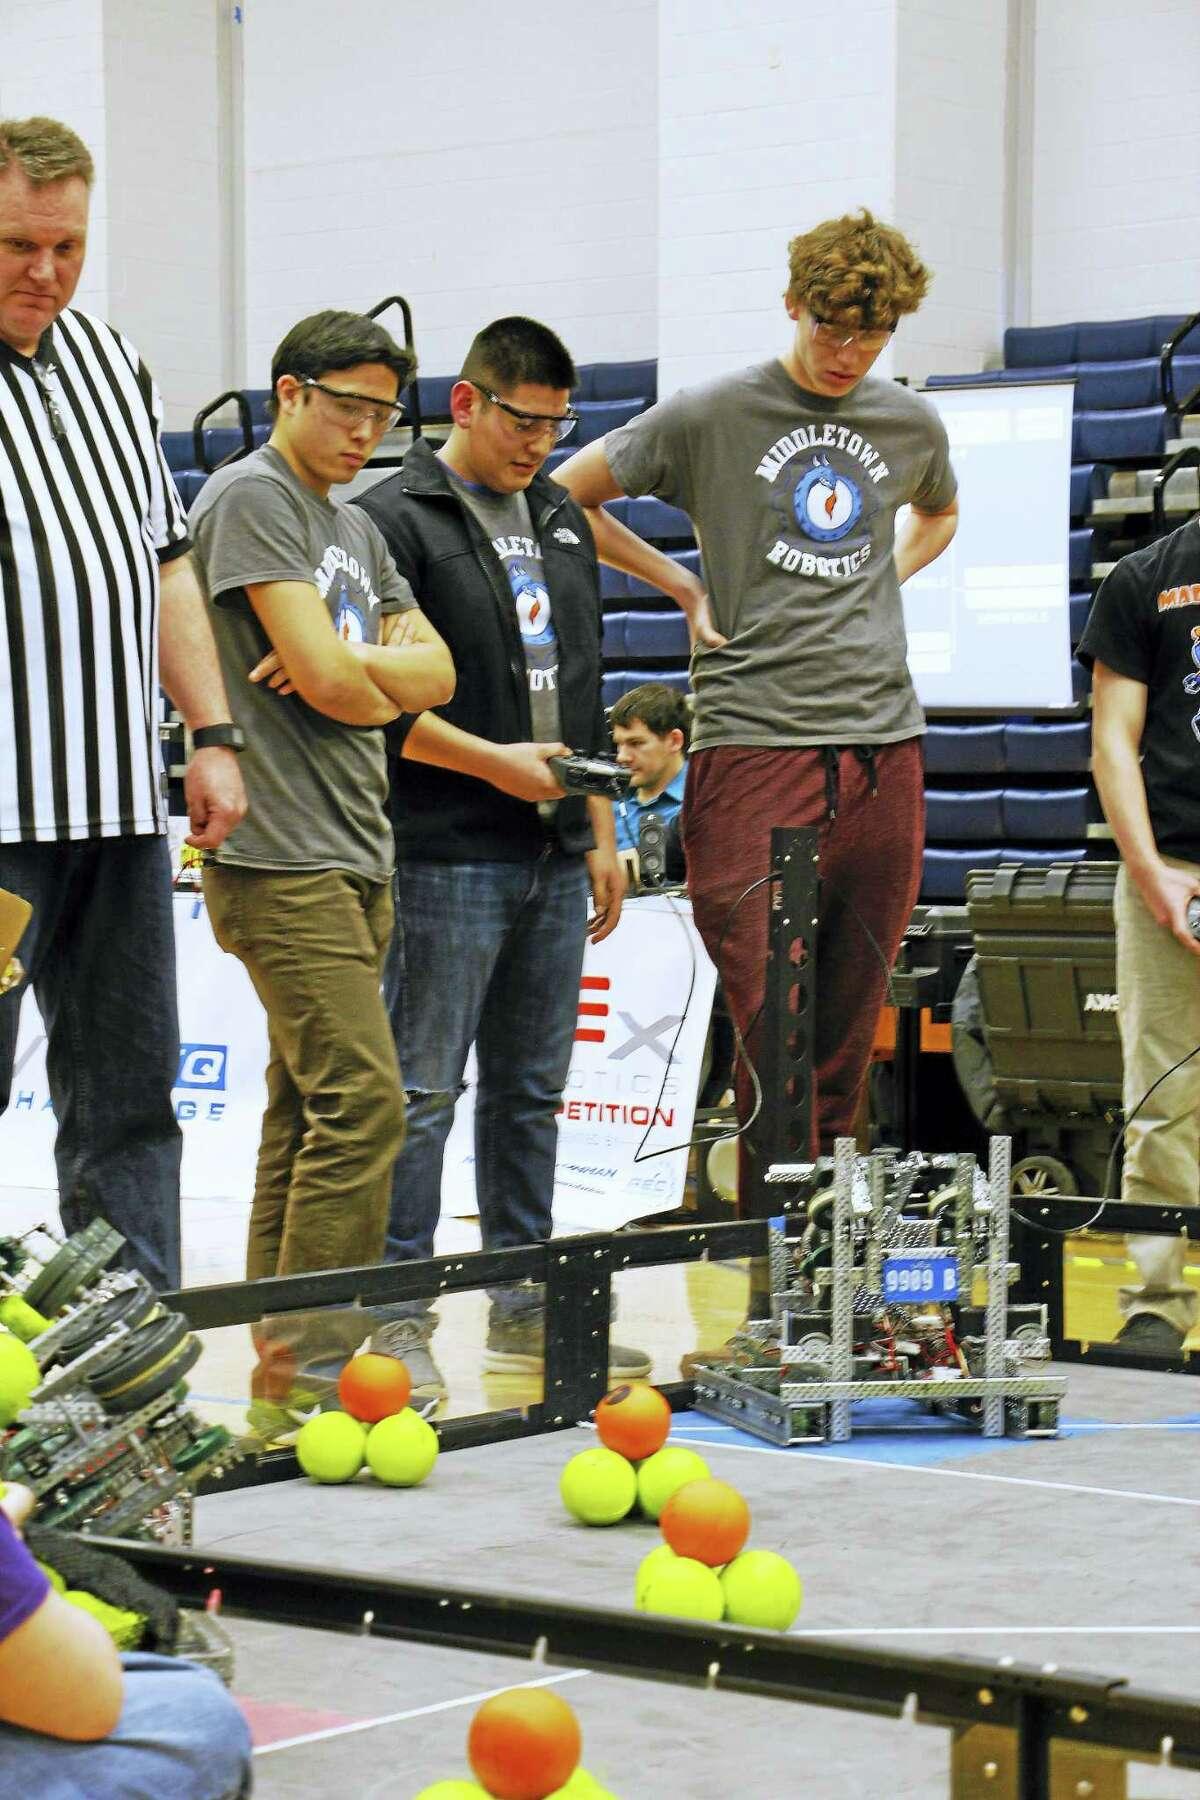 Courtesy photo Members of the Robotics Team 9909b, from left, are Daniel Feener, David Valencia and Nathaniel Spencer.